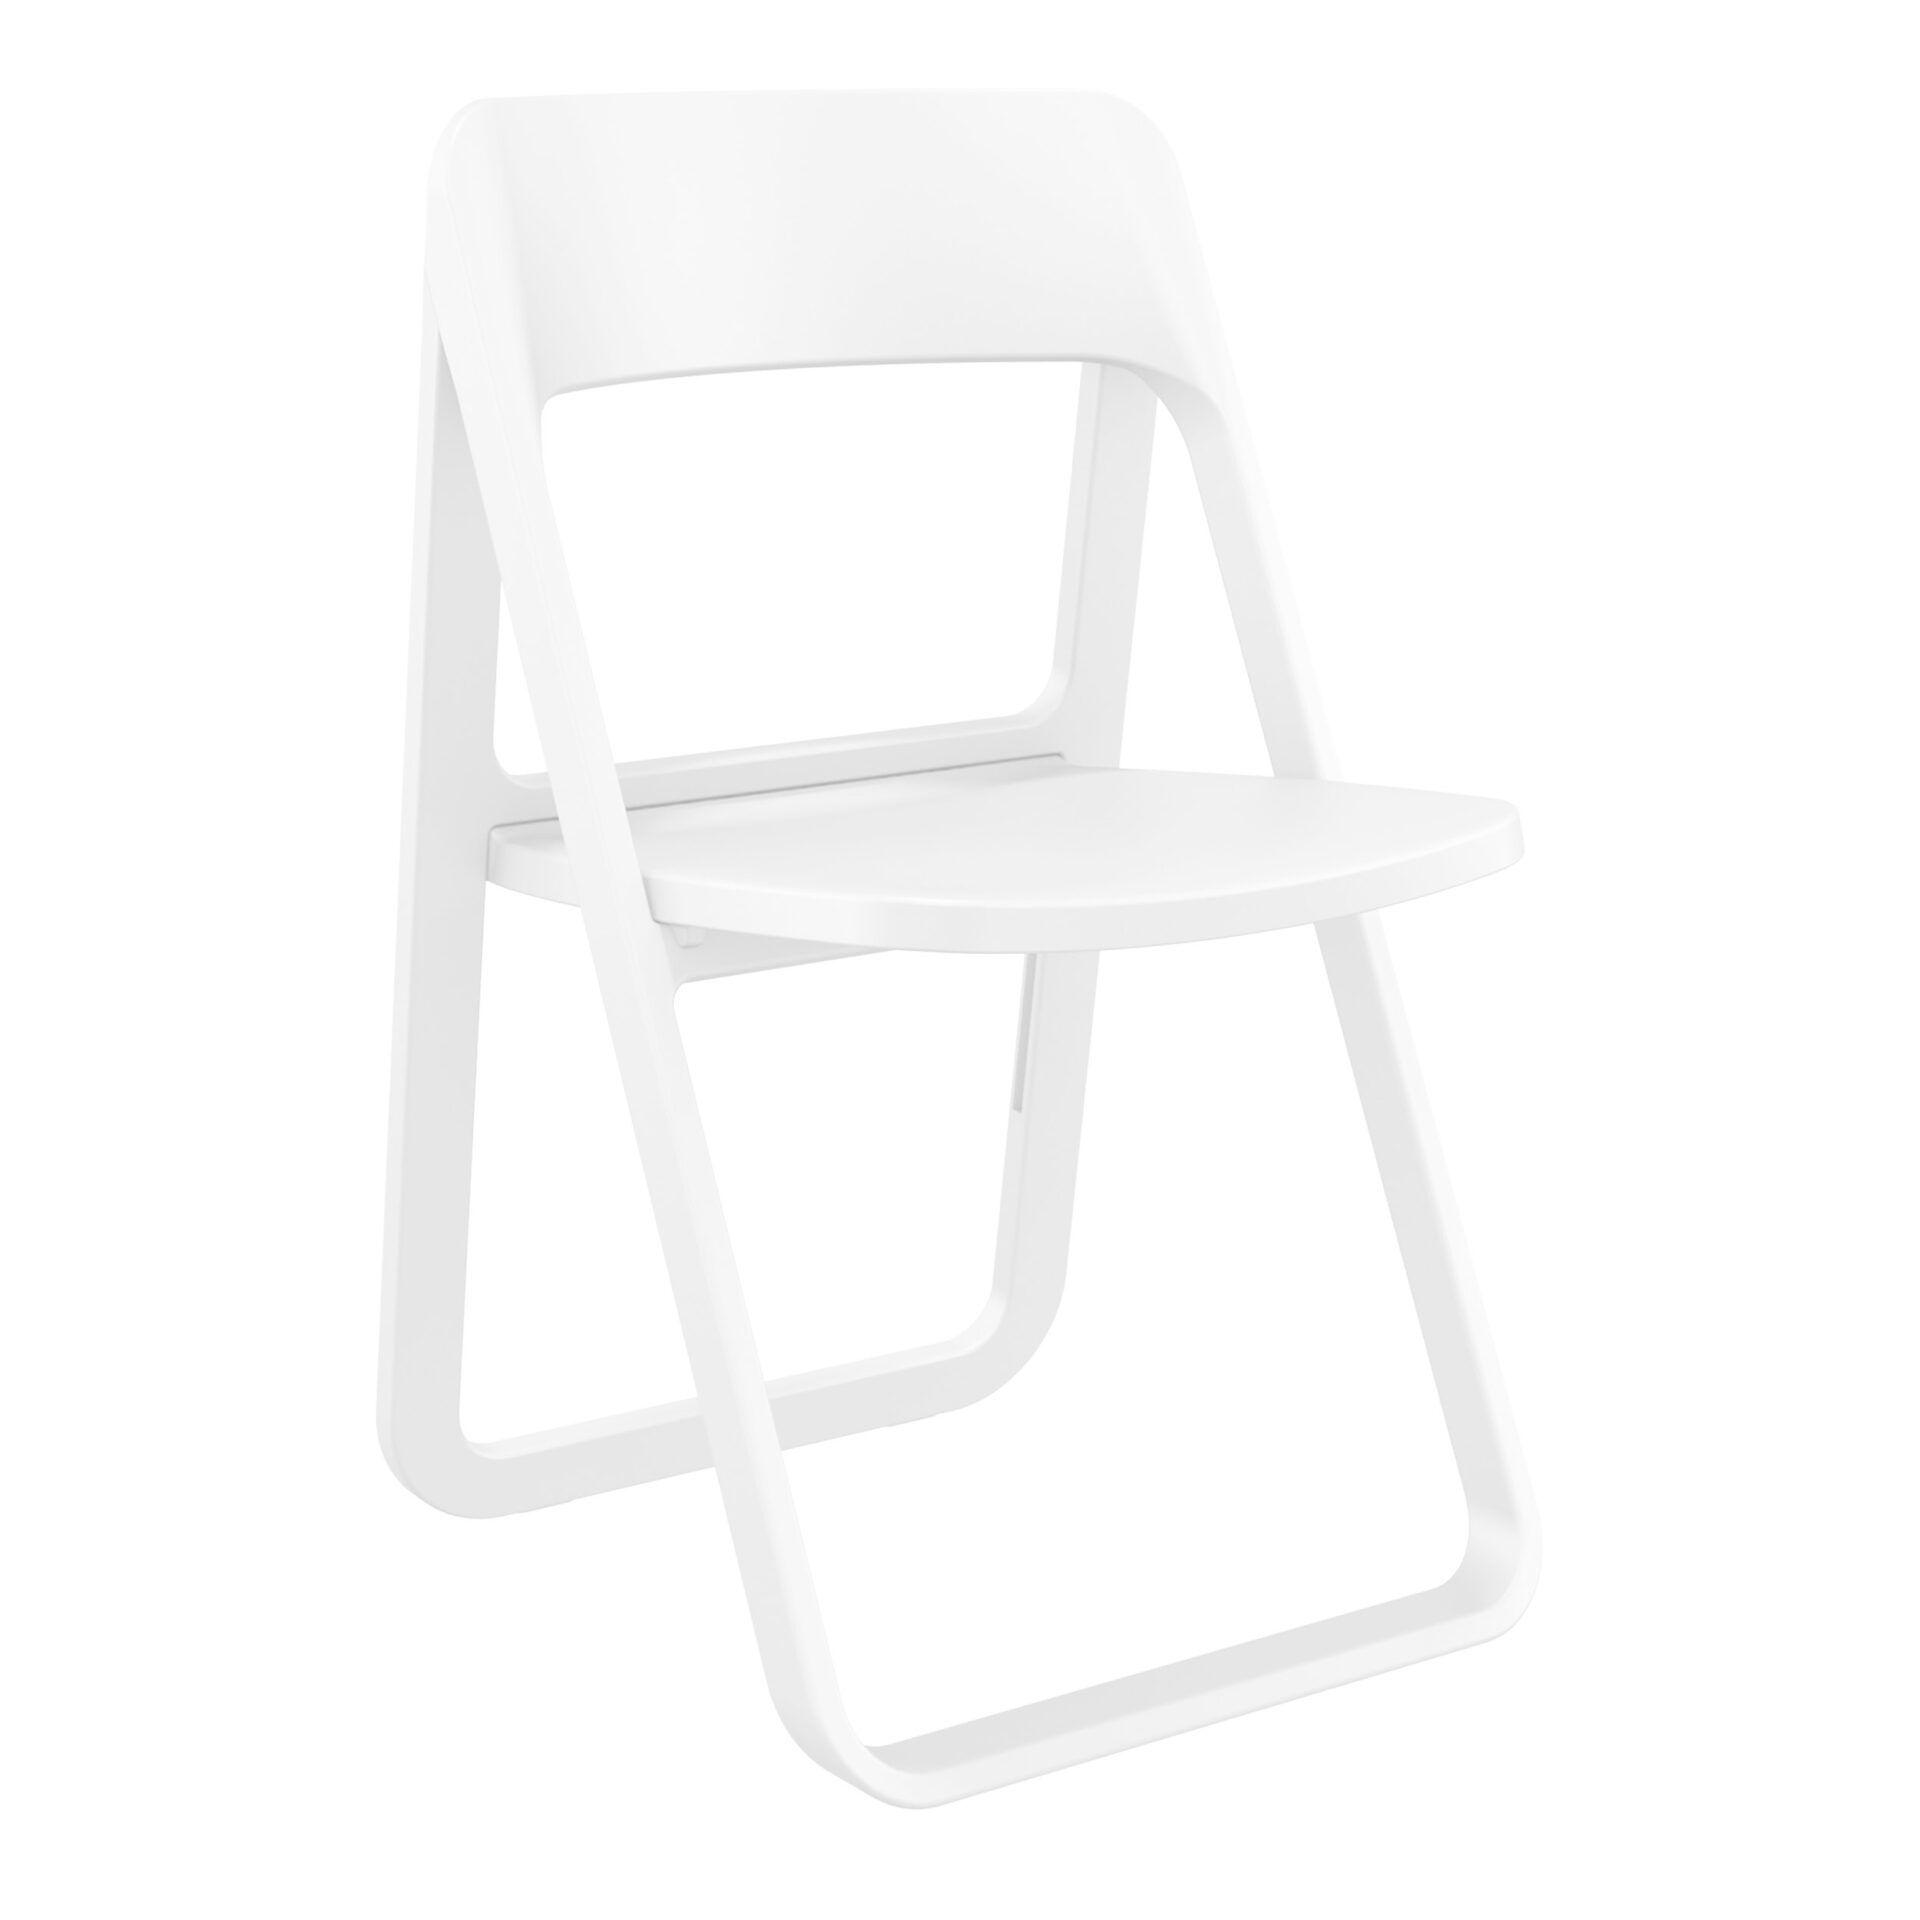 polypropylene dream folding chair white front side